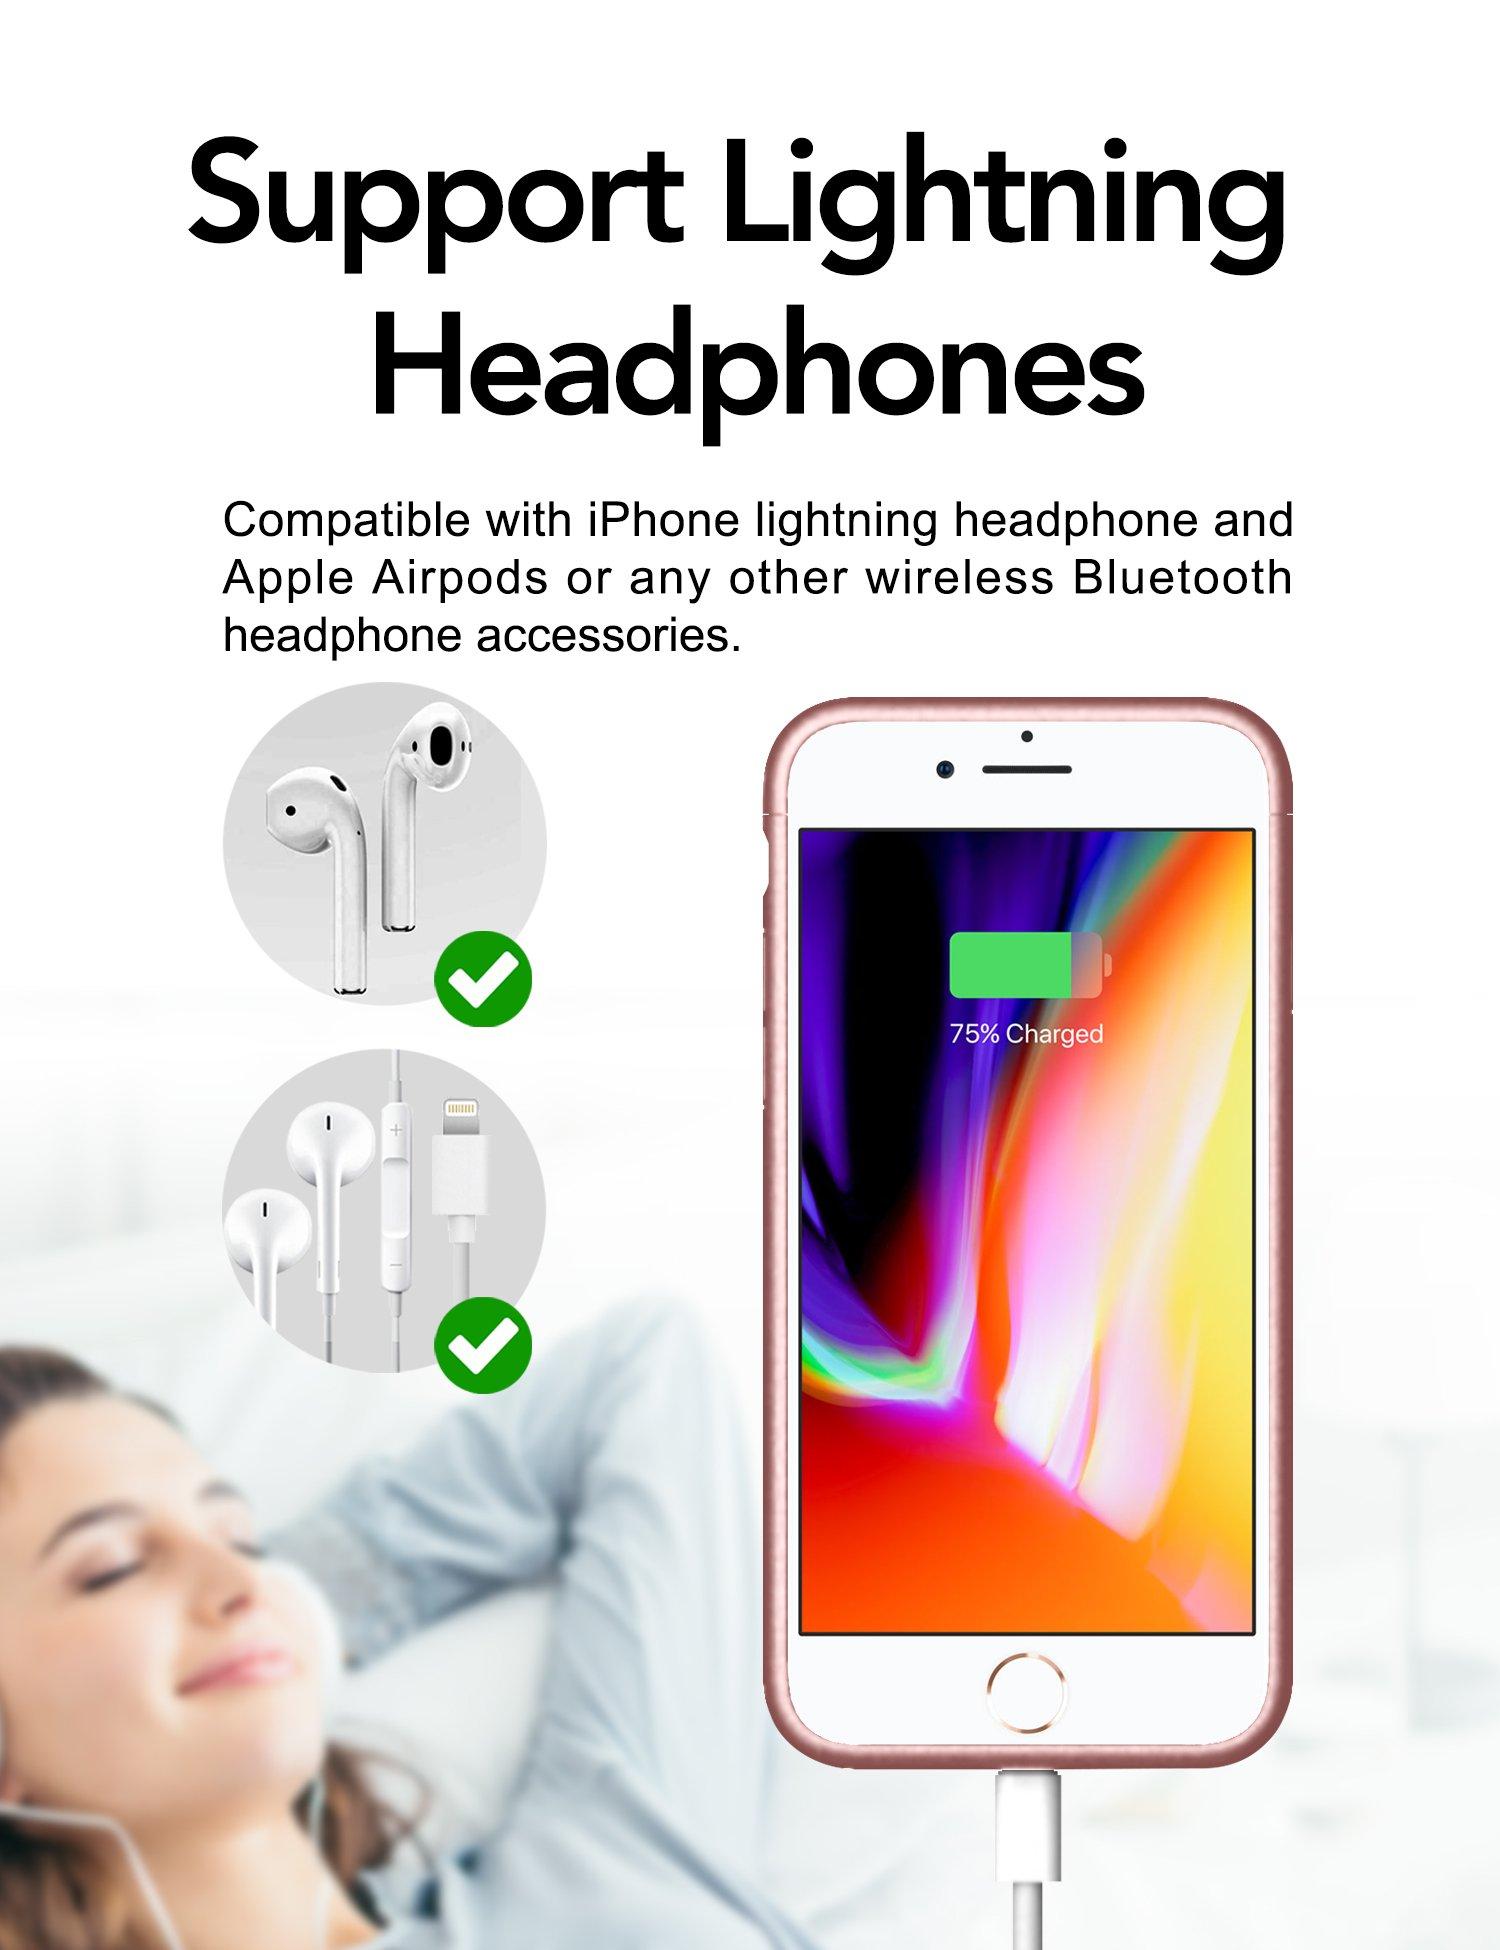 Aose Battery Case Iphone 8 Plus 7 Plus Support Lightning Headphones